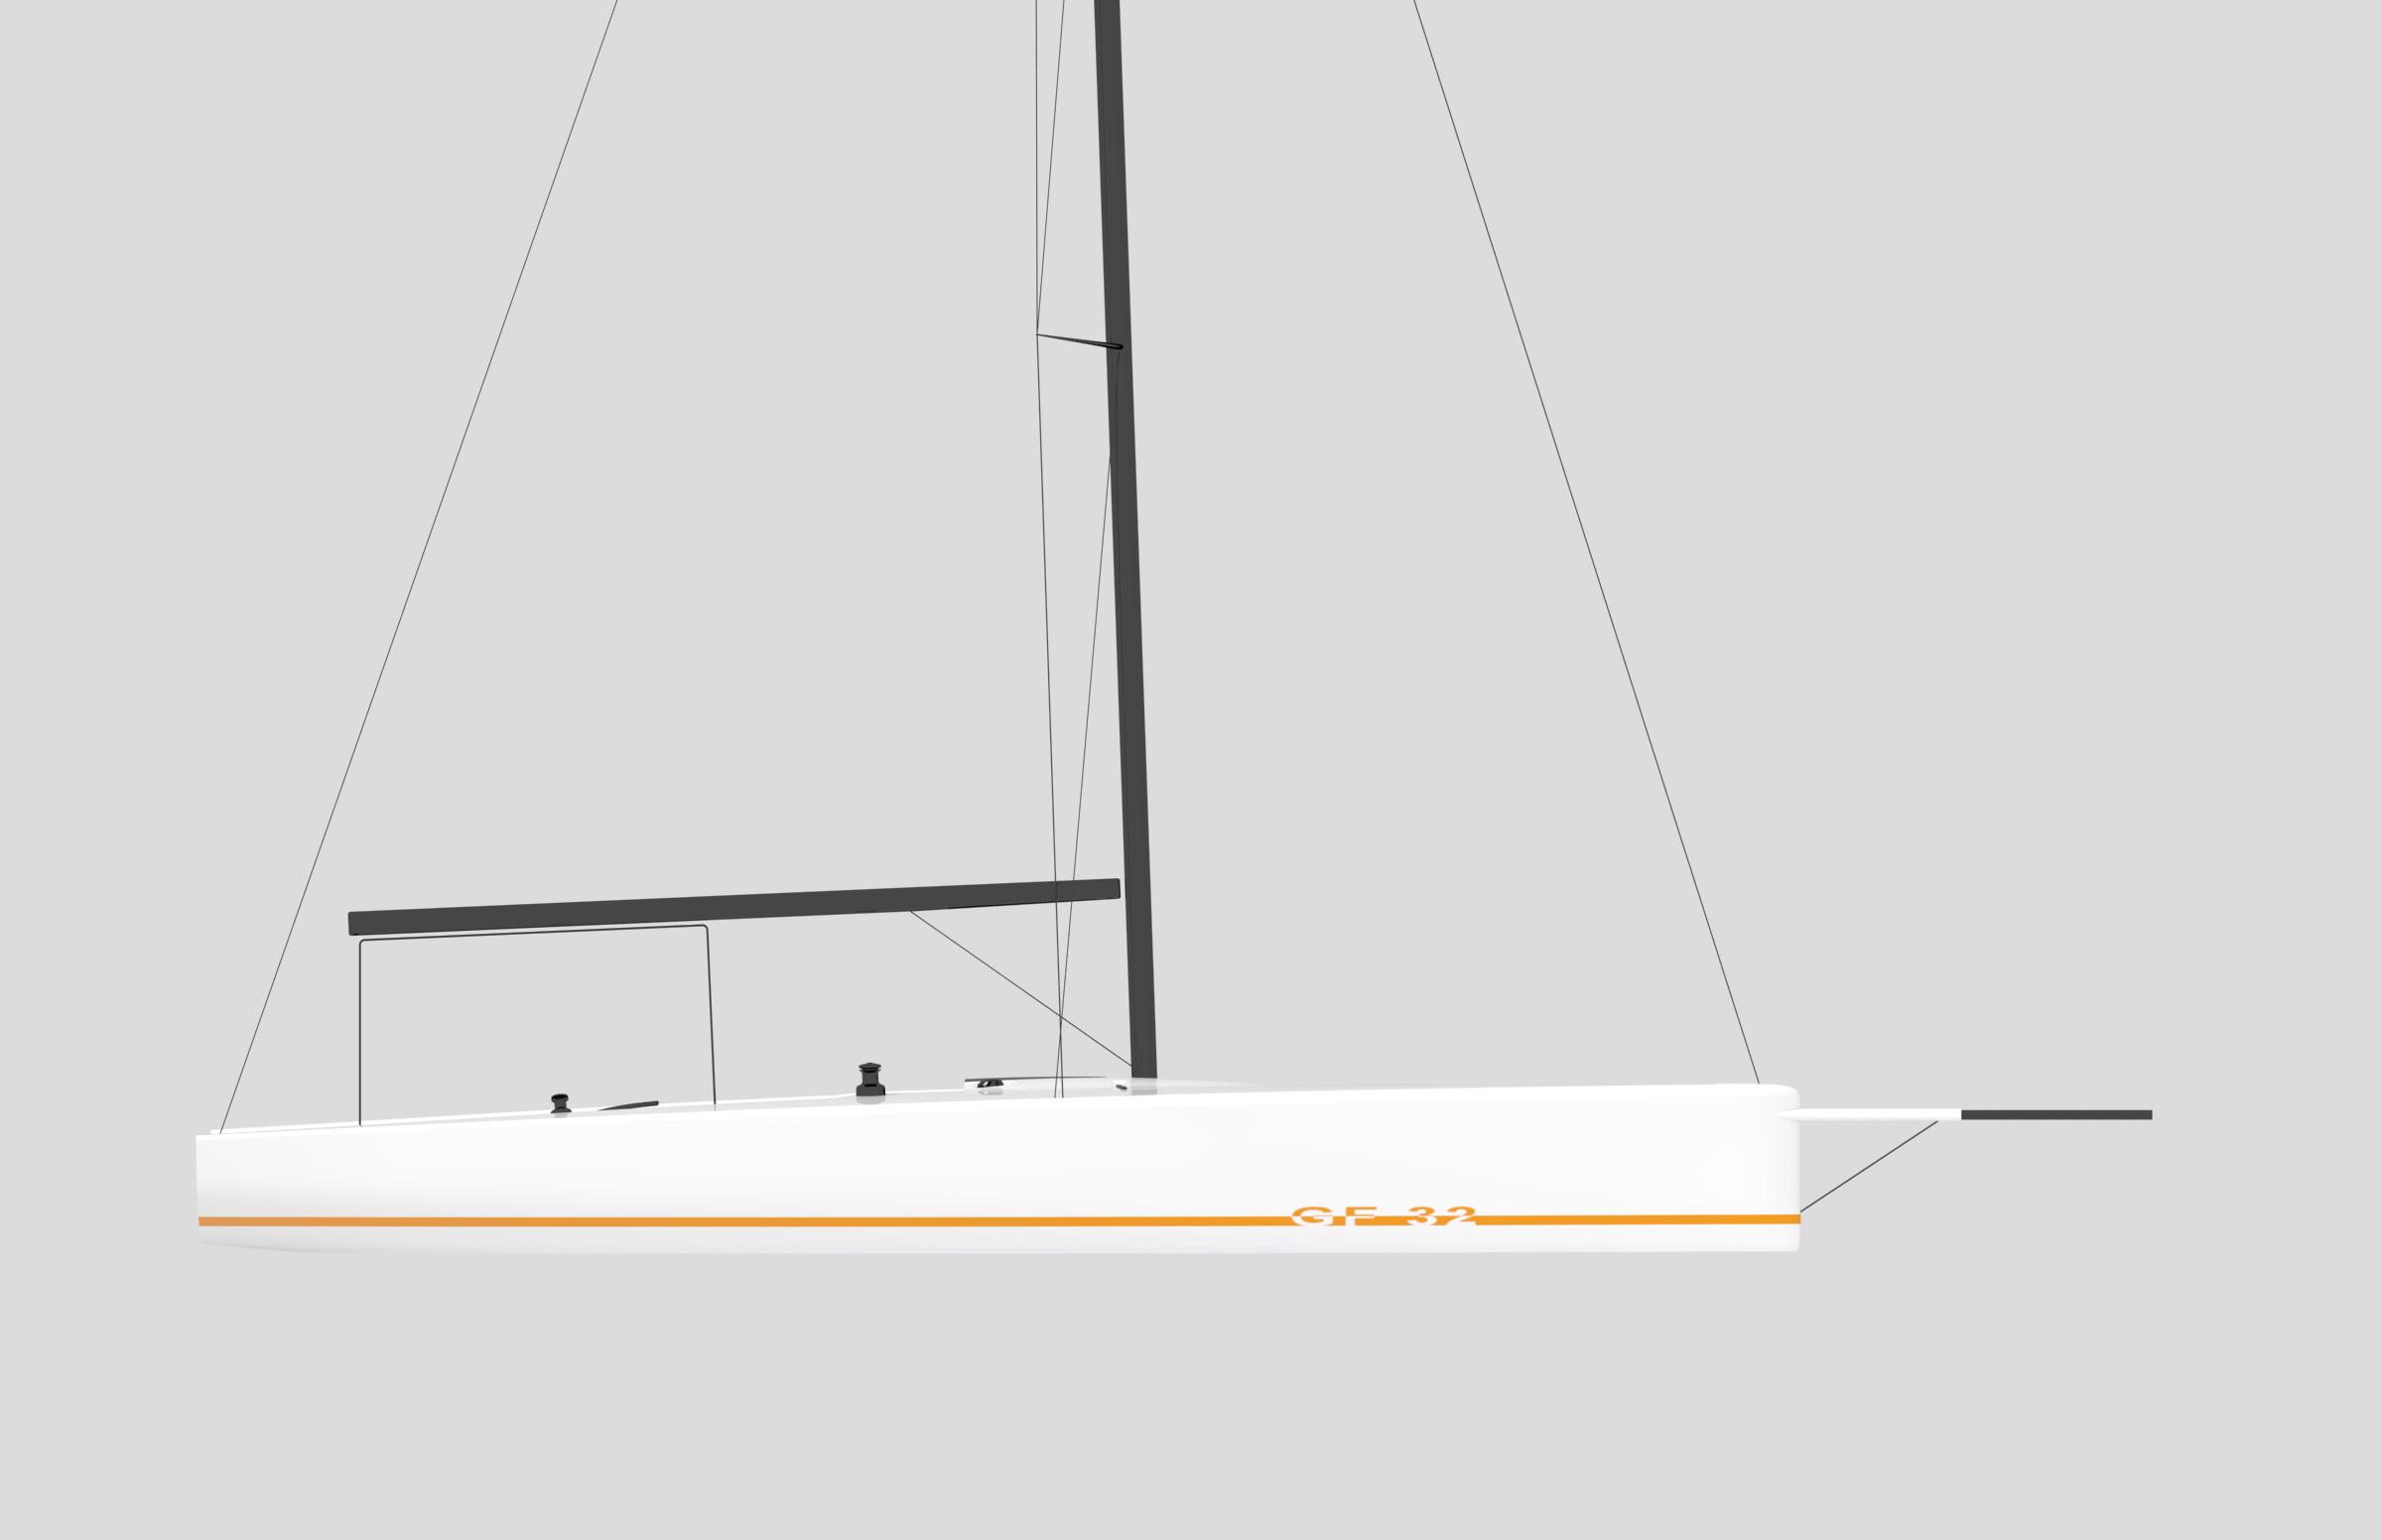 REICHEL/PUGH YACHT DESIGN - X-Treme 32